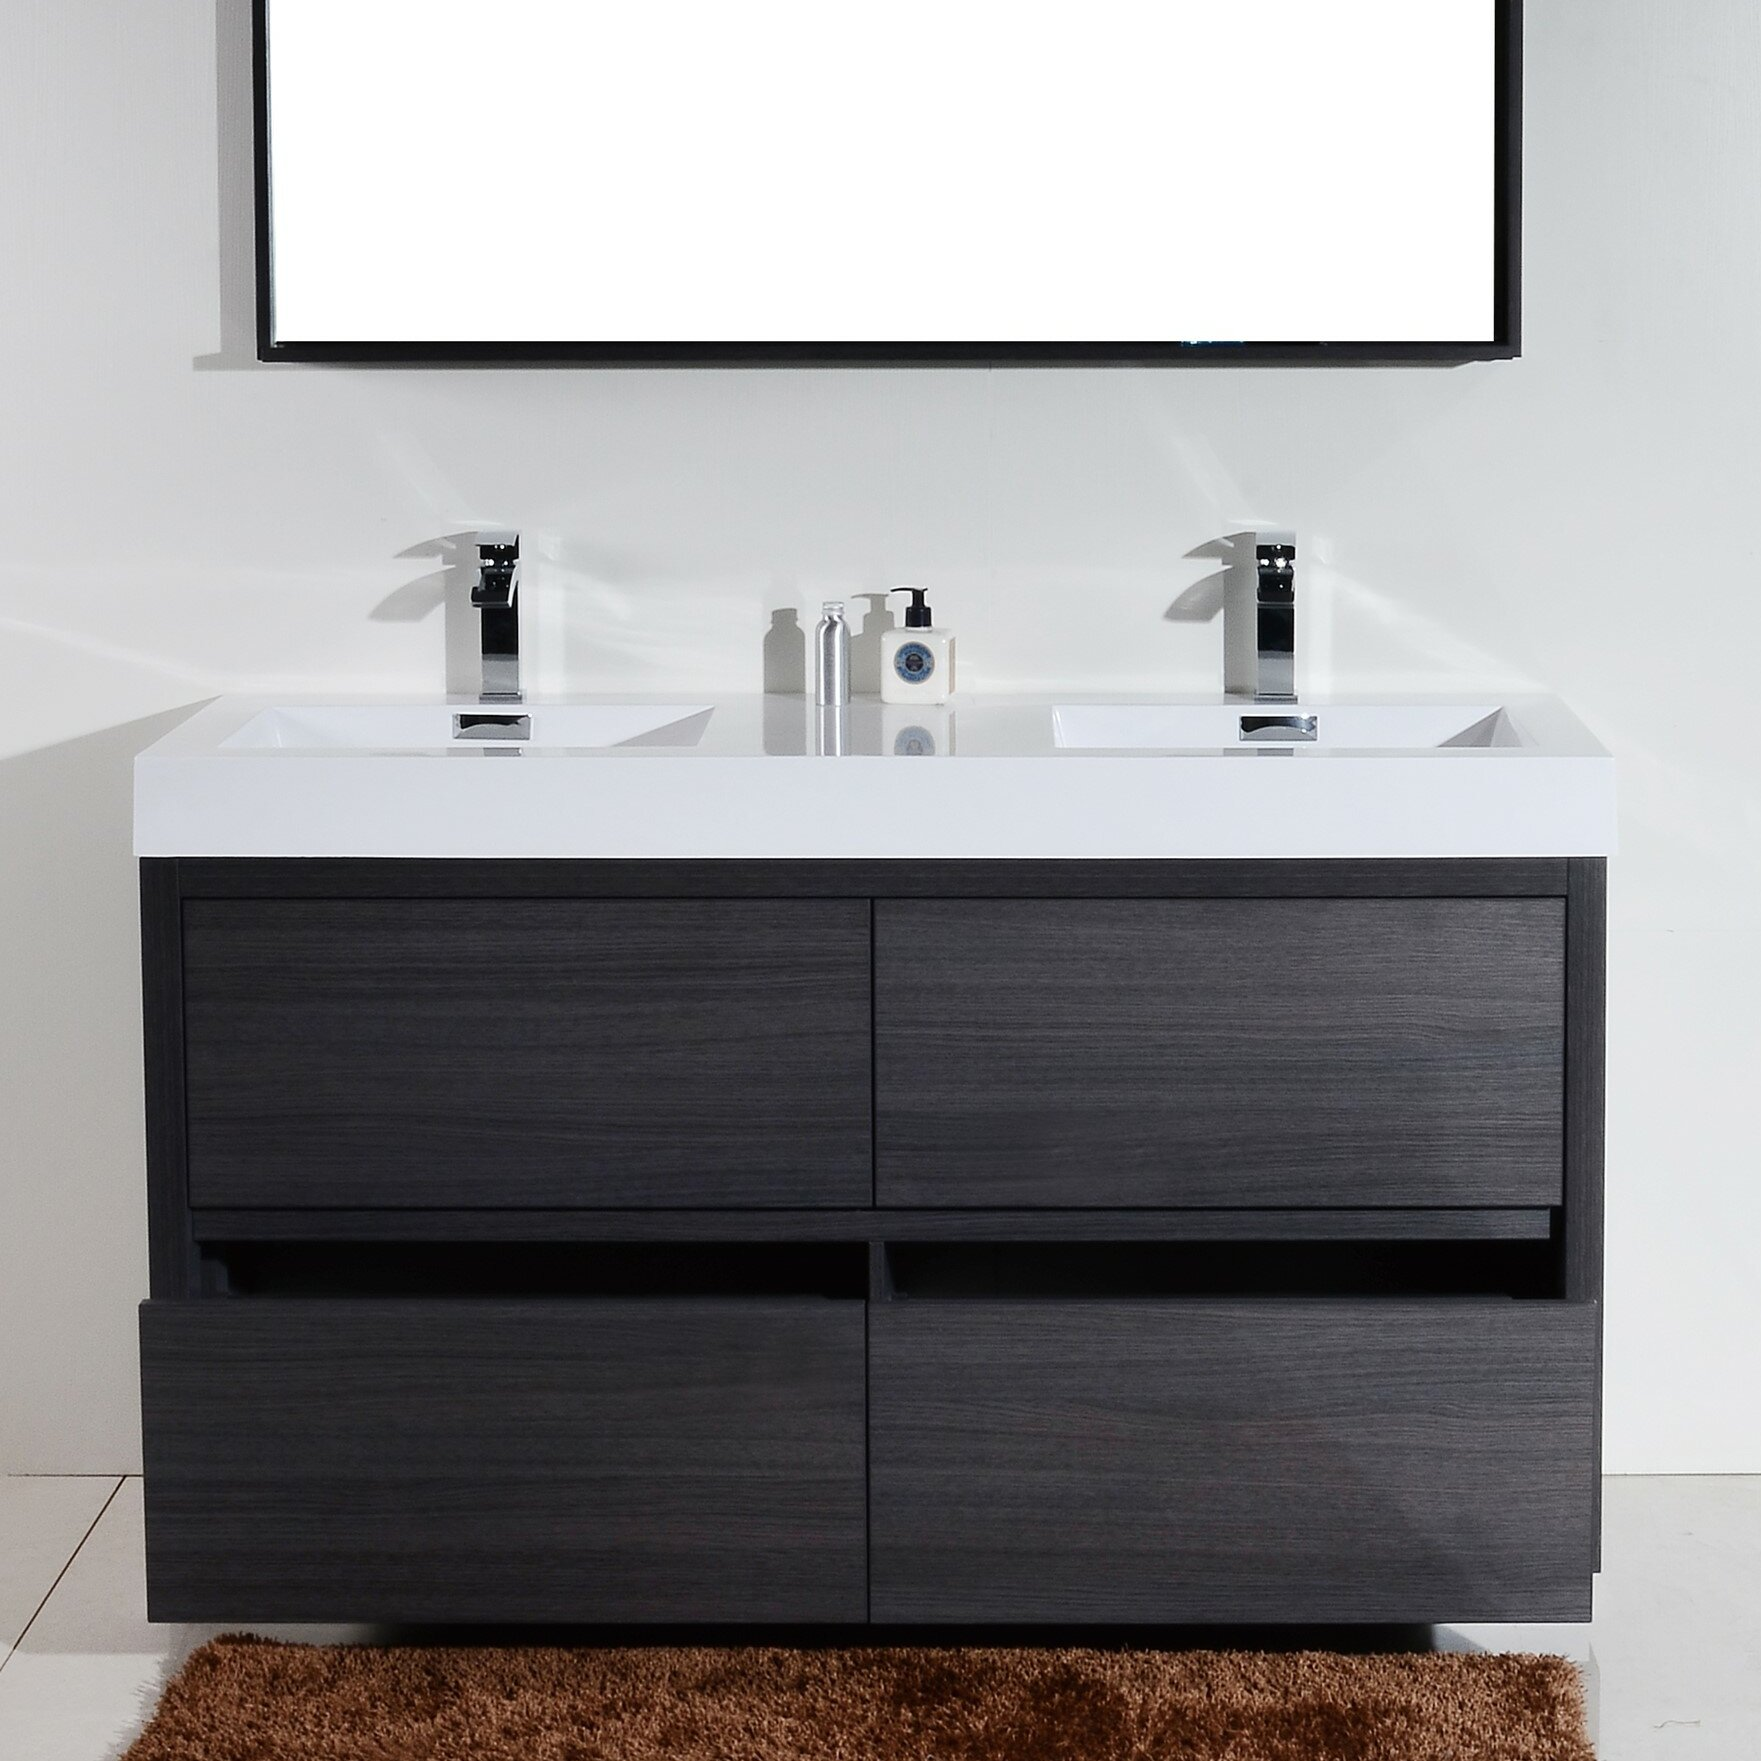 Kube Bath Bliss 60 Double Free Standing Modern Bathroom Vanity .